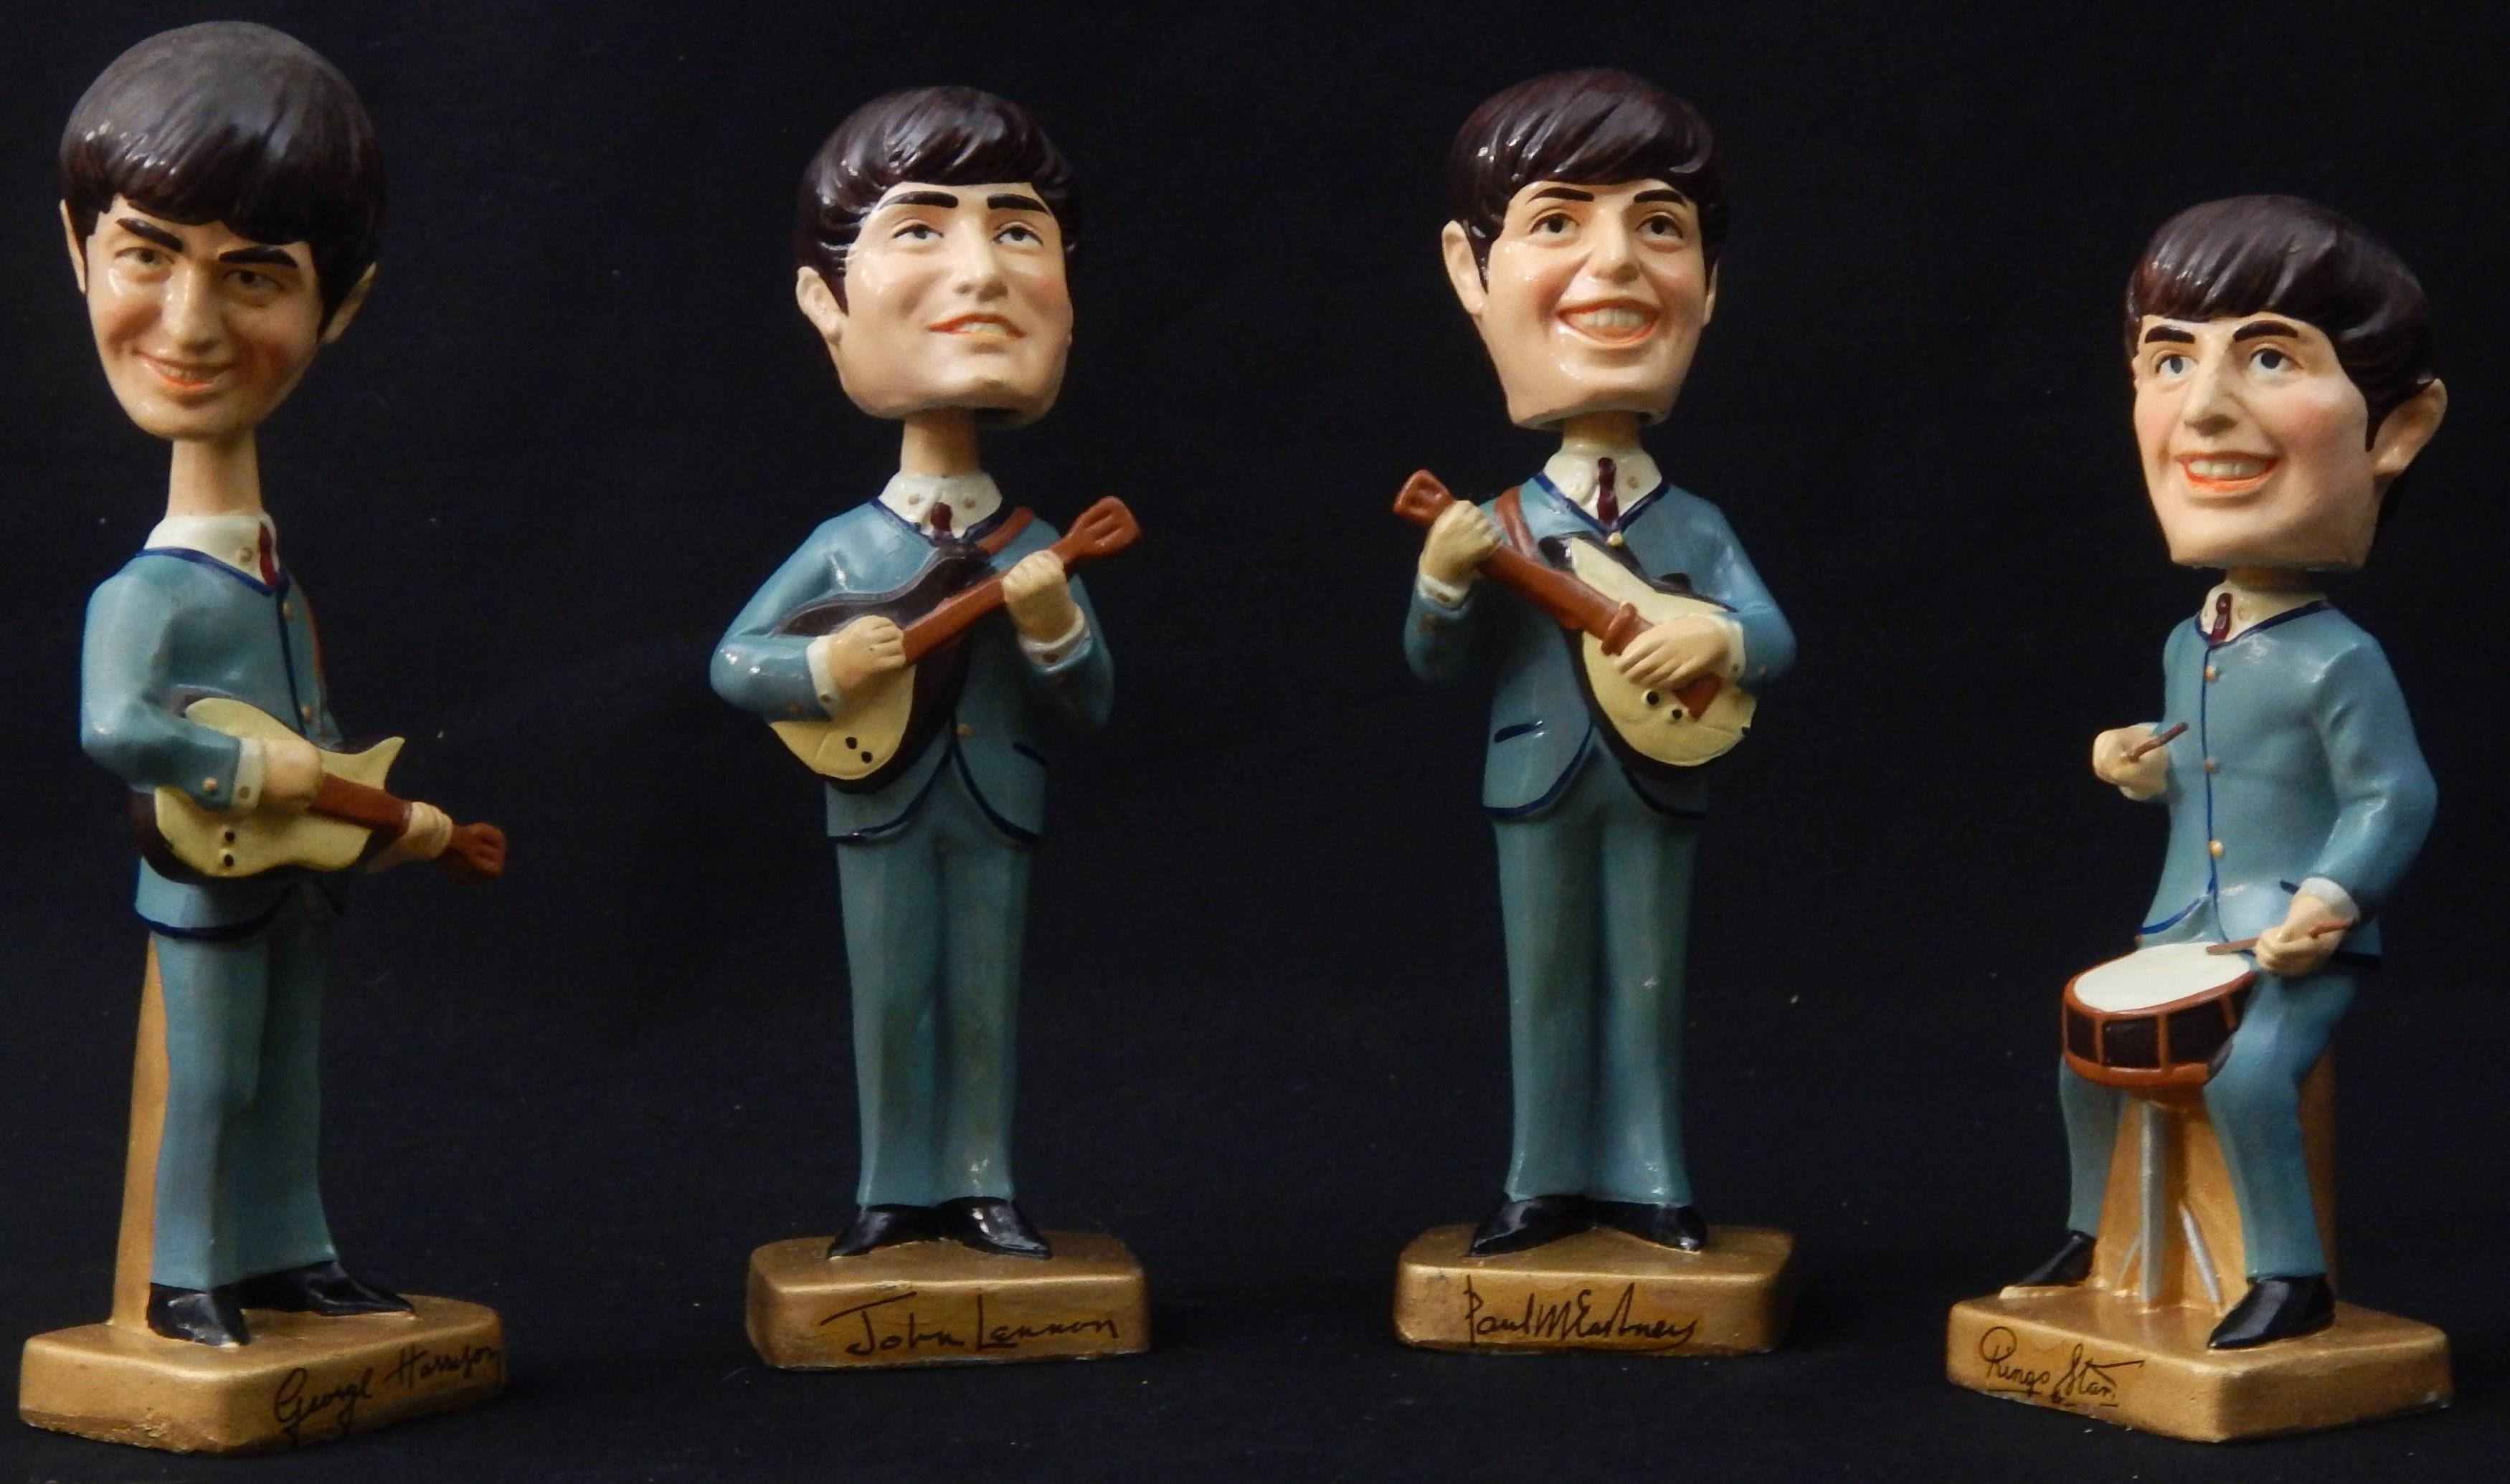 Beatles Memorabilia - Monthly 04-18